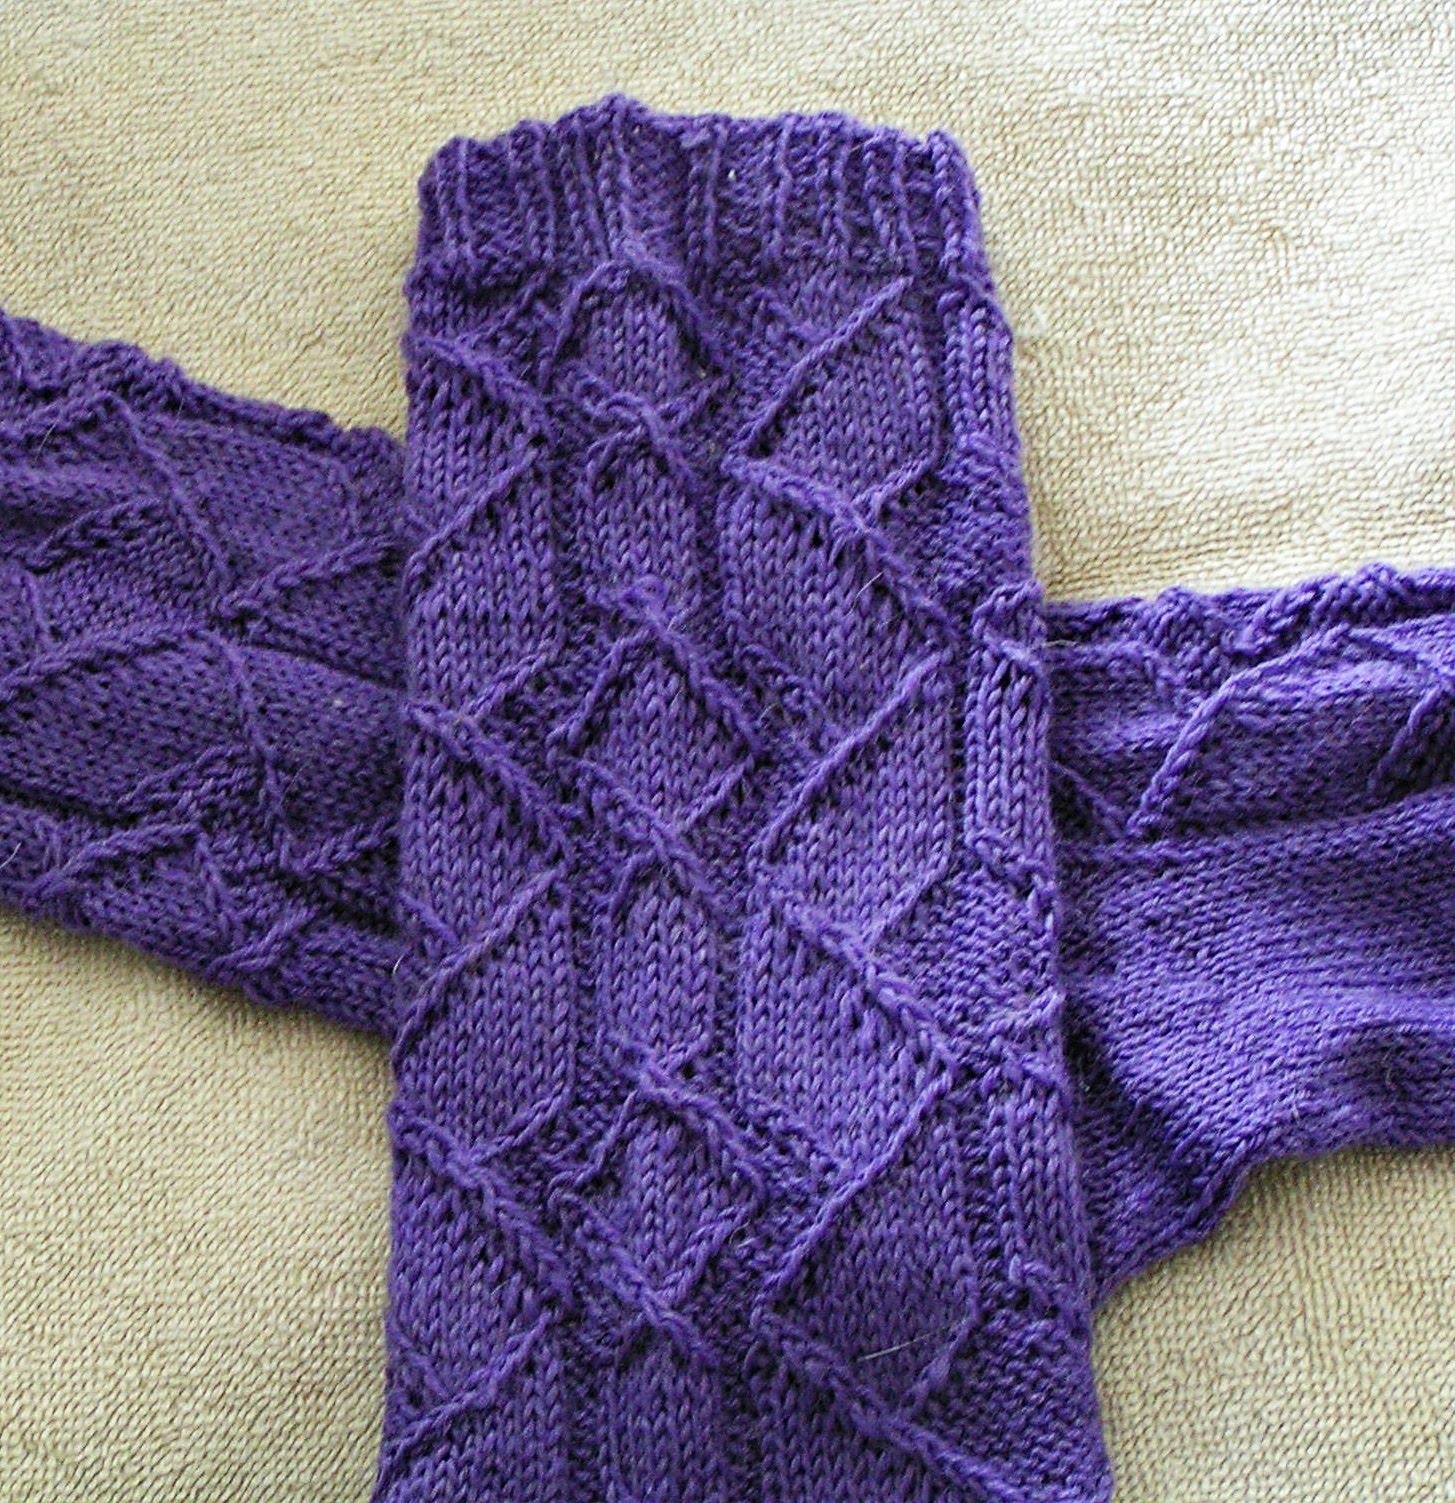 Sock Knitting Blogs : An Old Germans Knit Blog: The vagaries of sock knitting